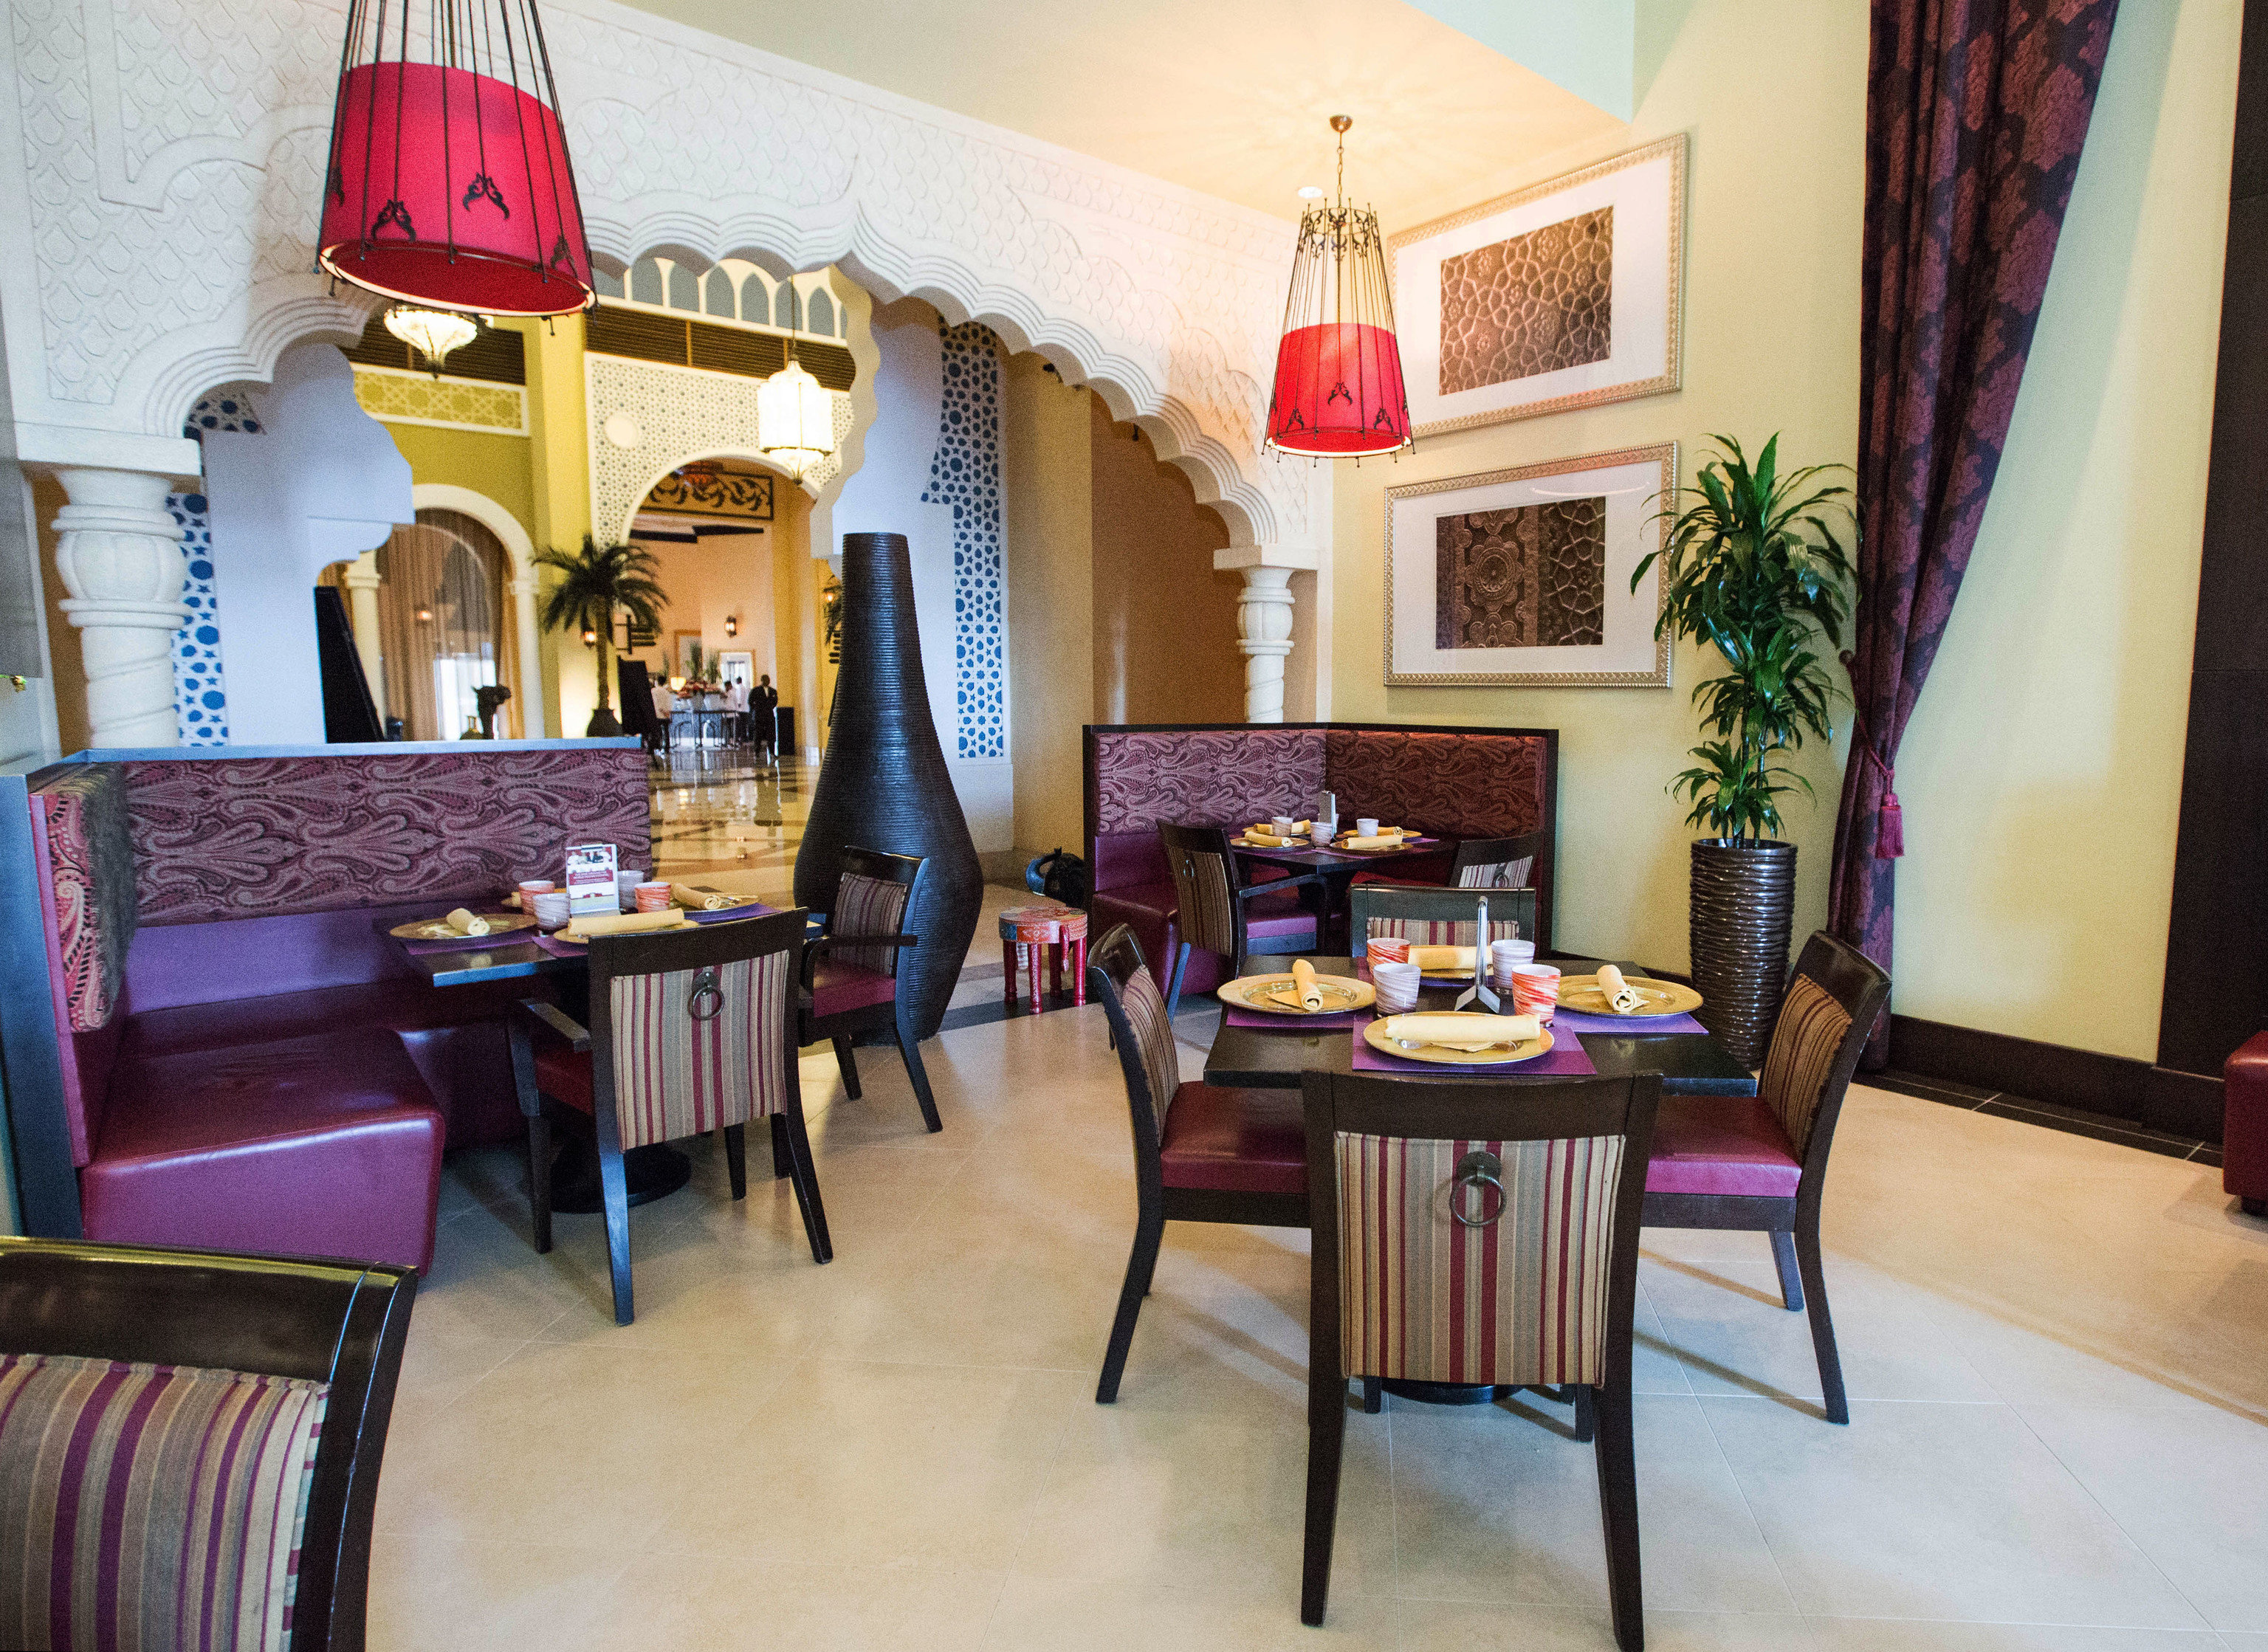 property house home living room cottage Villa Dining restaurant Suite